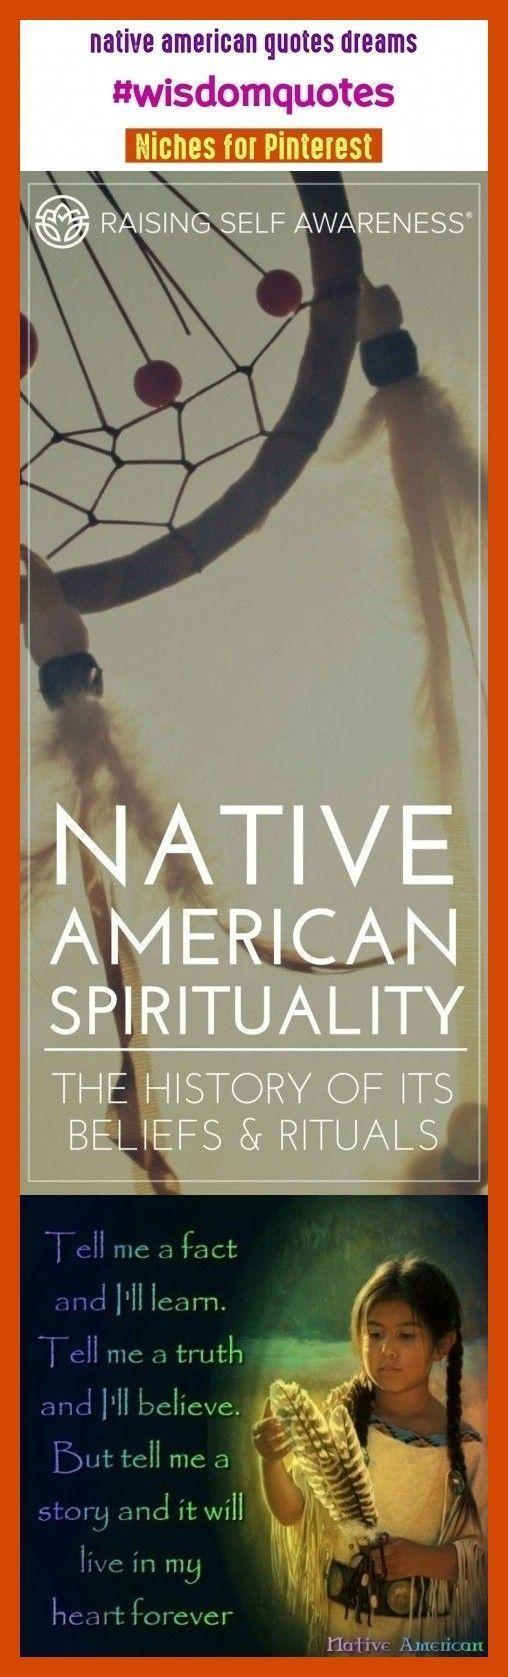 Leben Zitiert Native American Quotes Wisdom Indianische Zitate Weisheit Na Funny Quotes